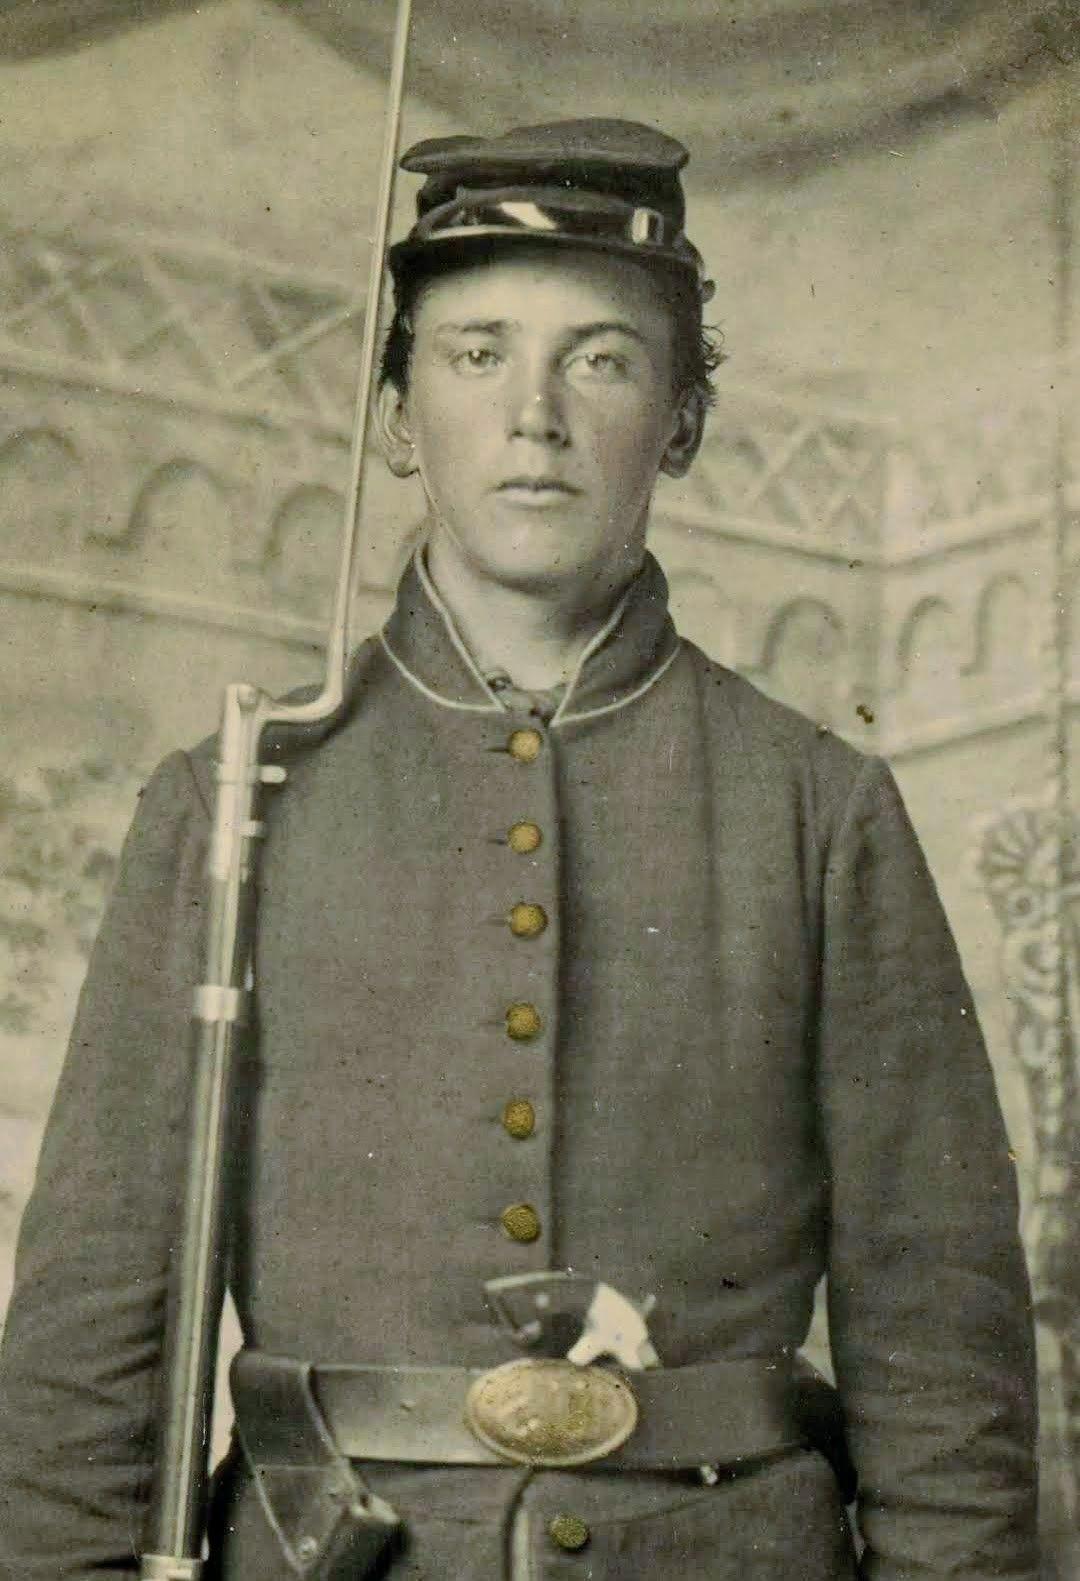 Such A Young Face Civil War History American Civil War Civil War Confederate